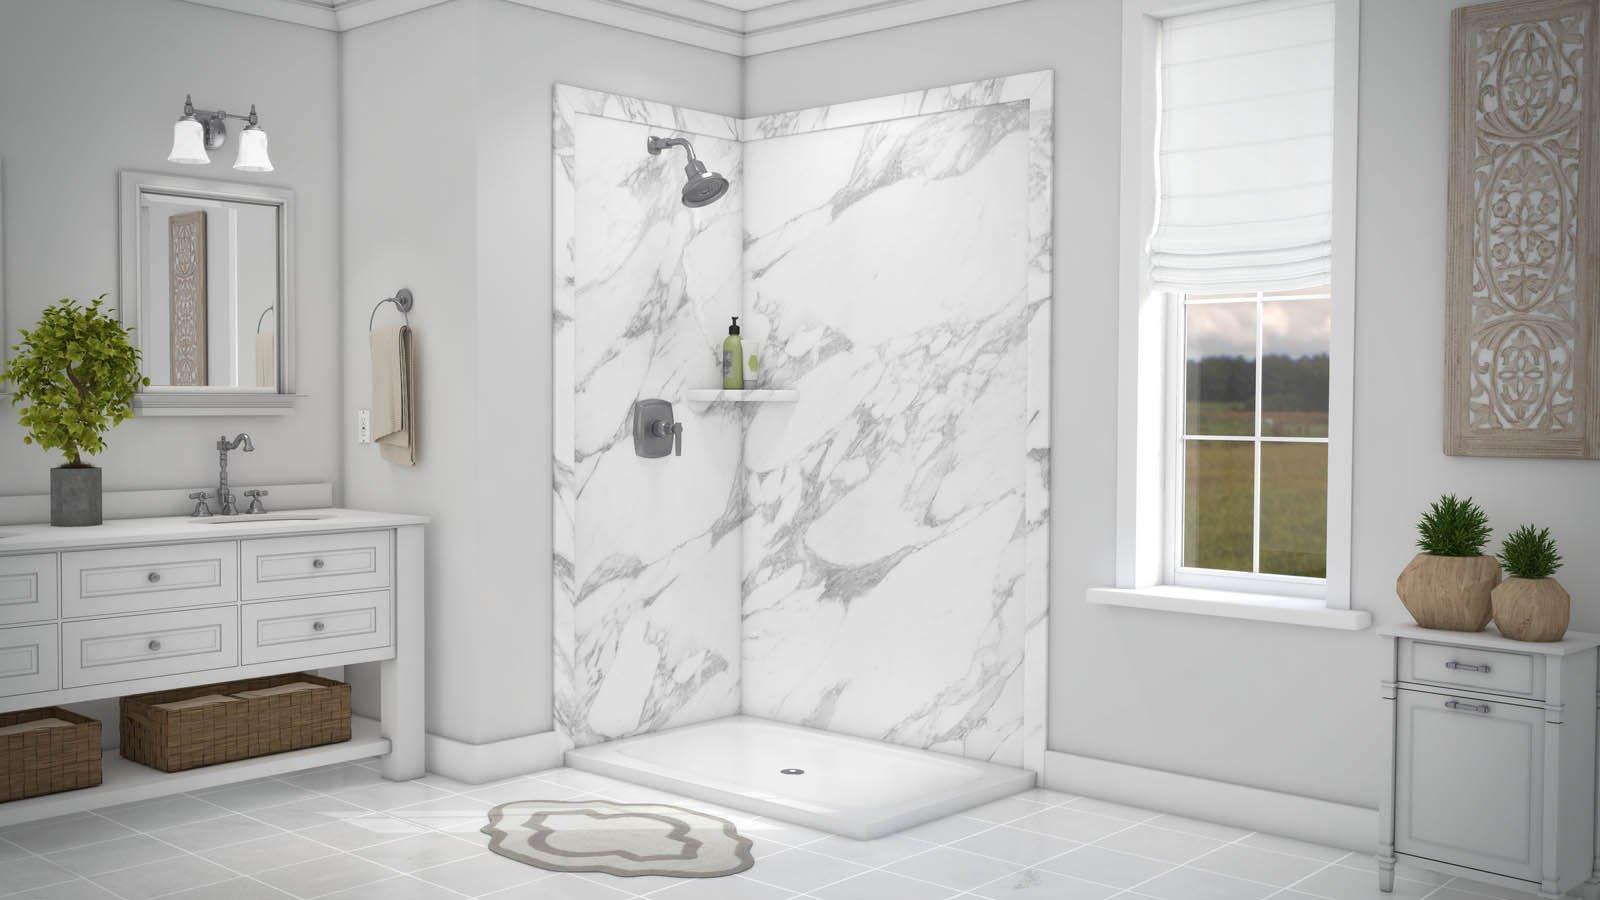 Bathroom Accessories & Remodeling: Shower Doors, Wall Panels, Tub ...